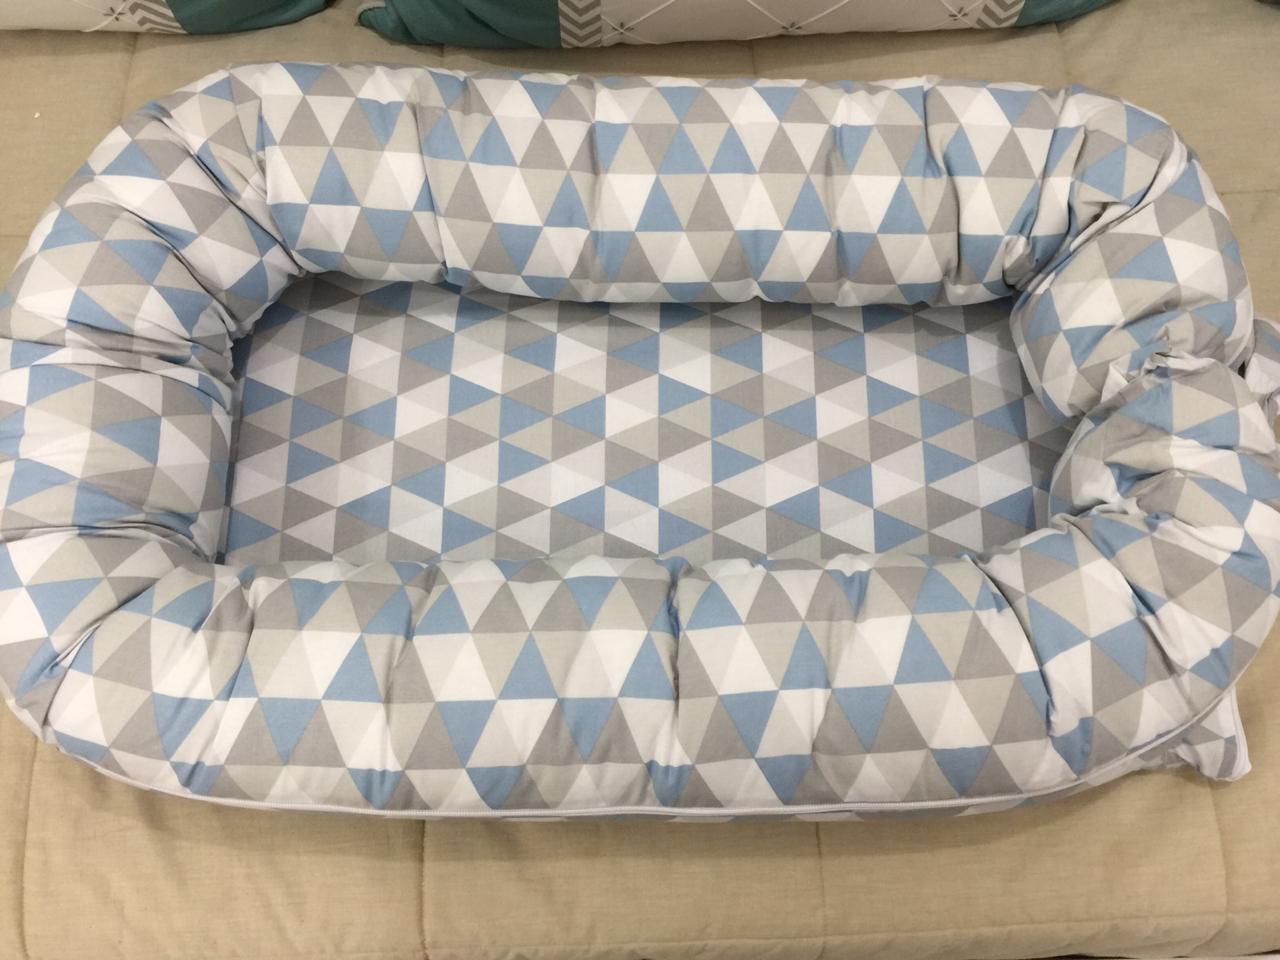 Ninho Redutor Geométrico Triângulo Azul e Cinza